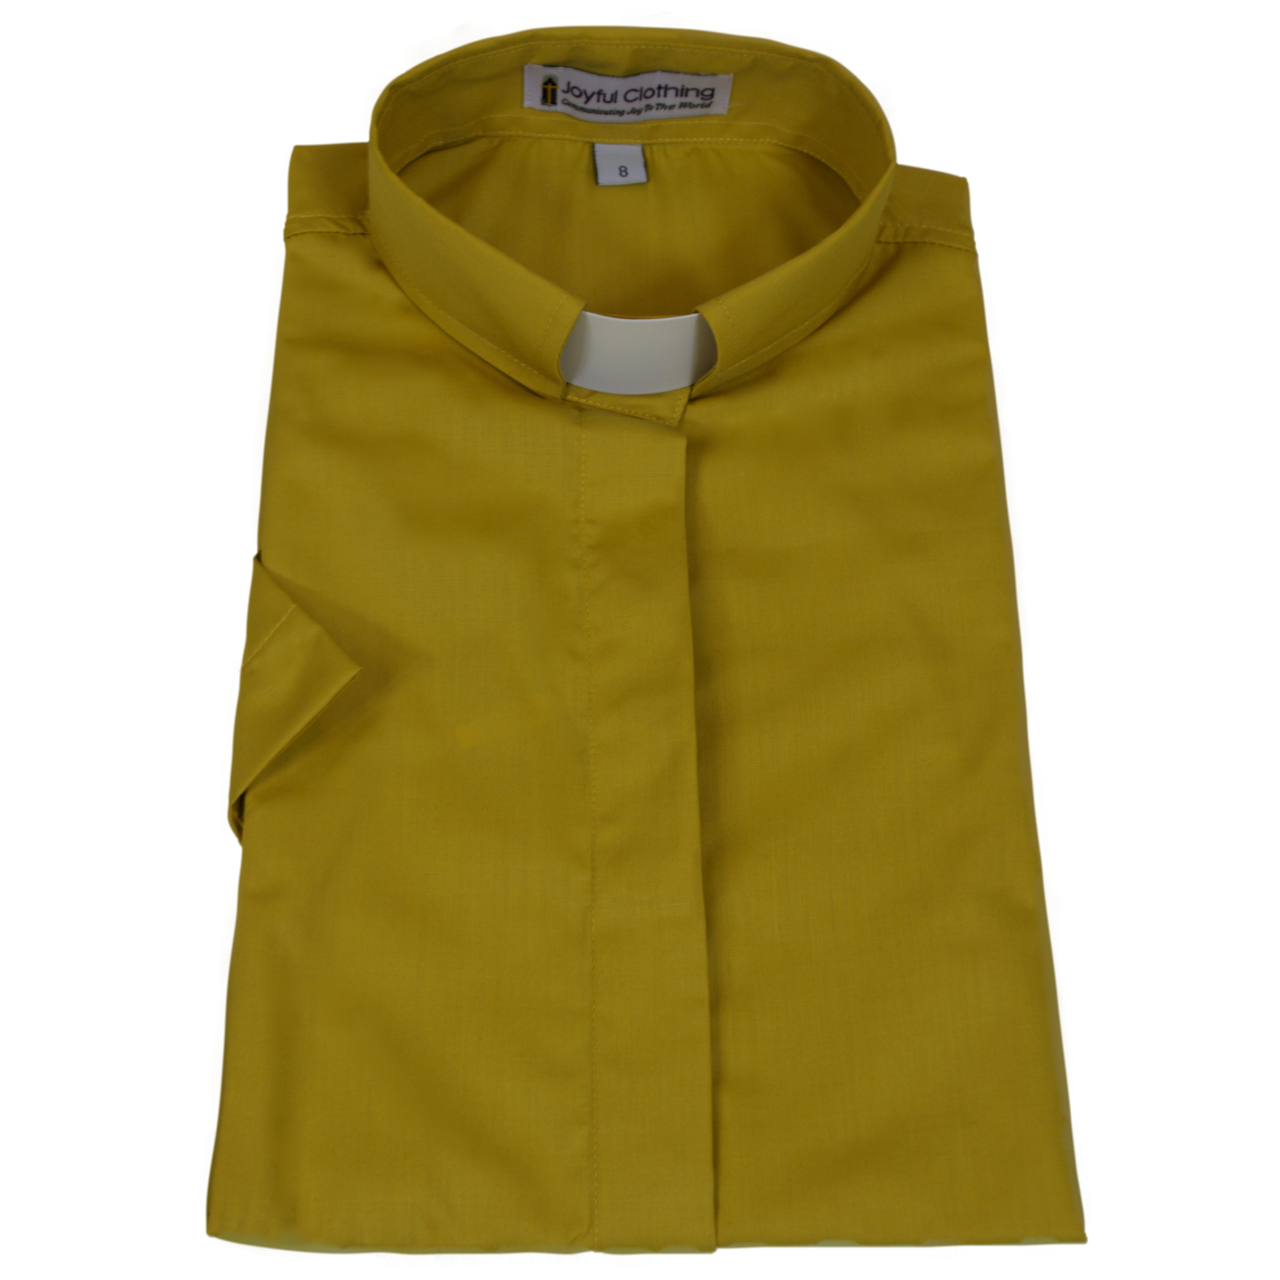 585. Women's Short-Sleeve Tab-Collar Clergy Shirt - Church Gold